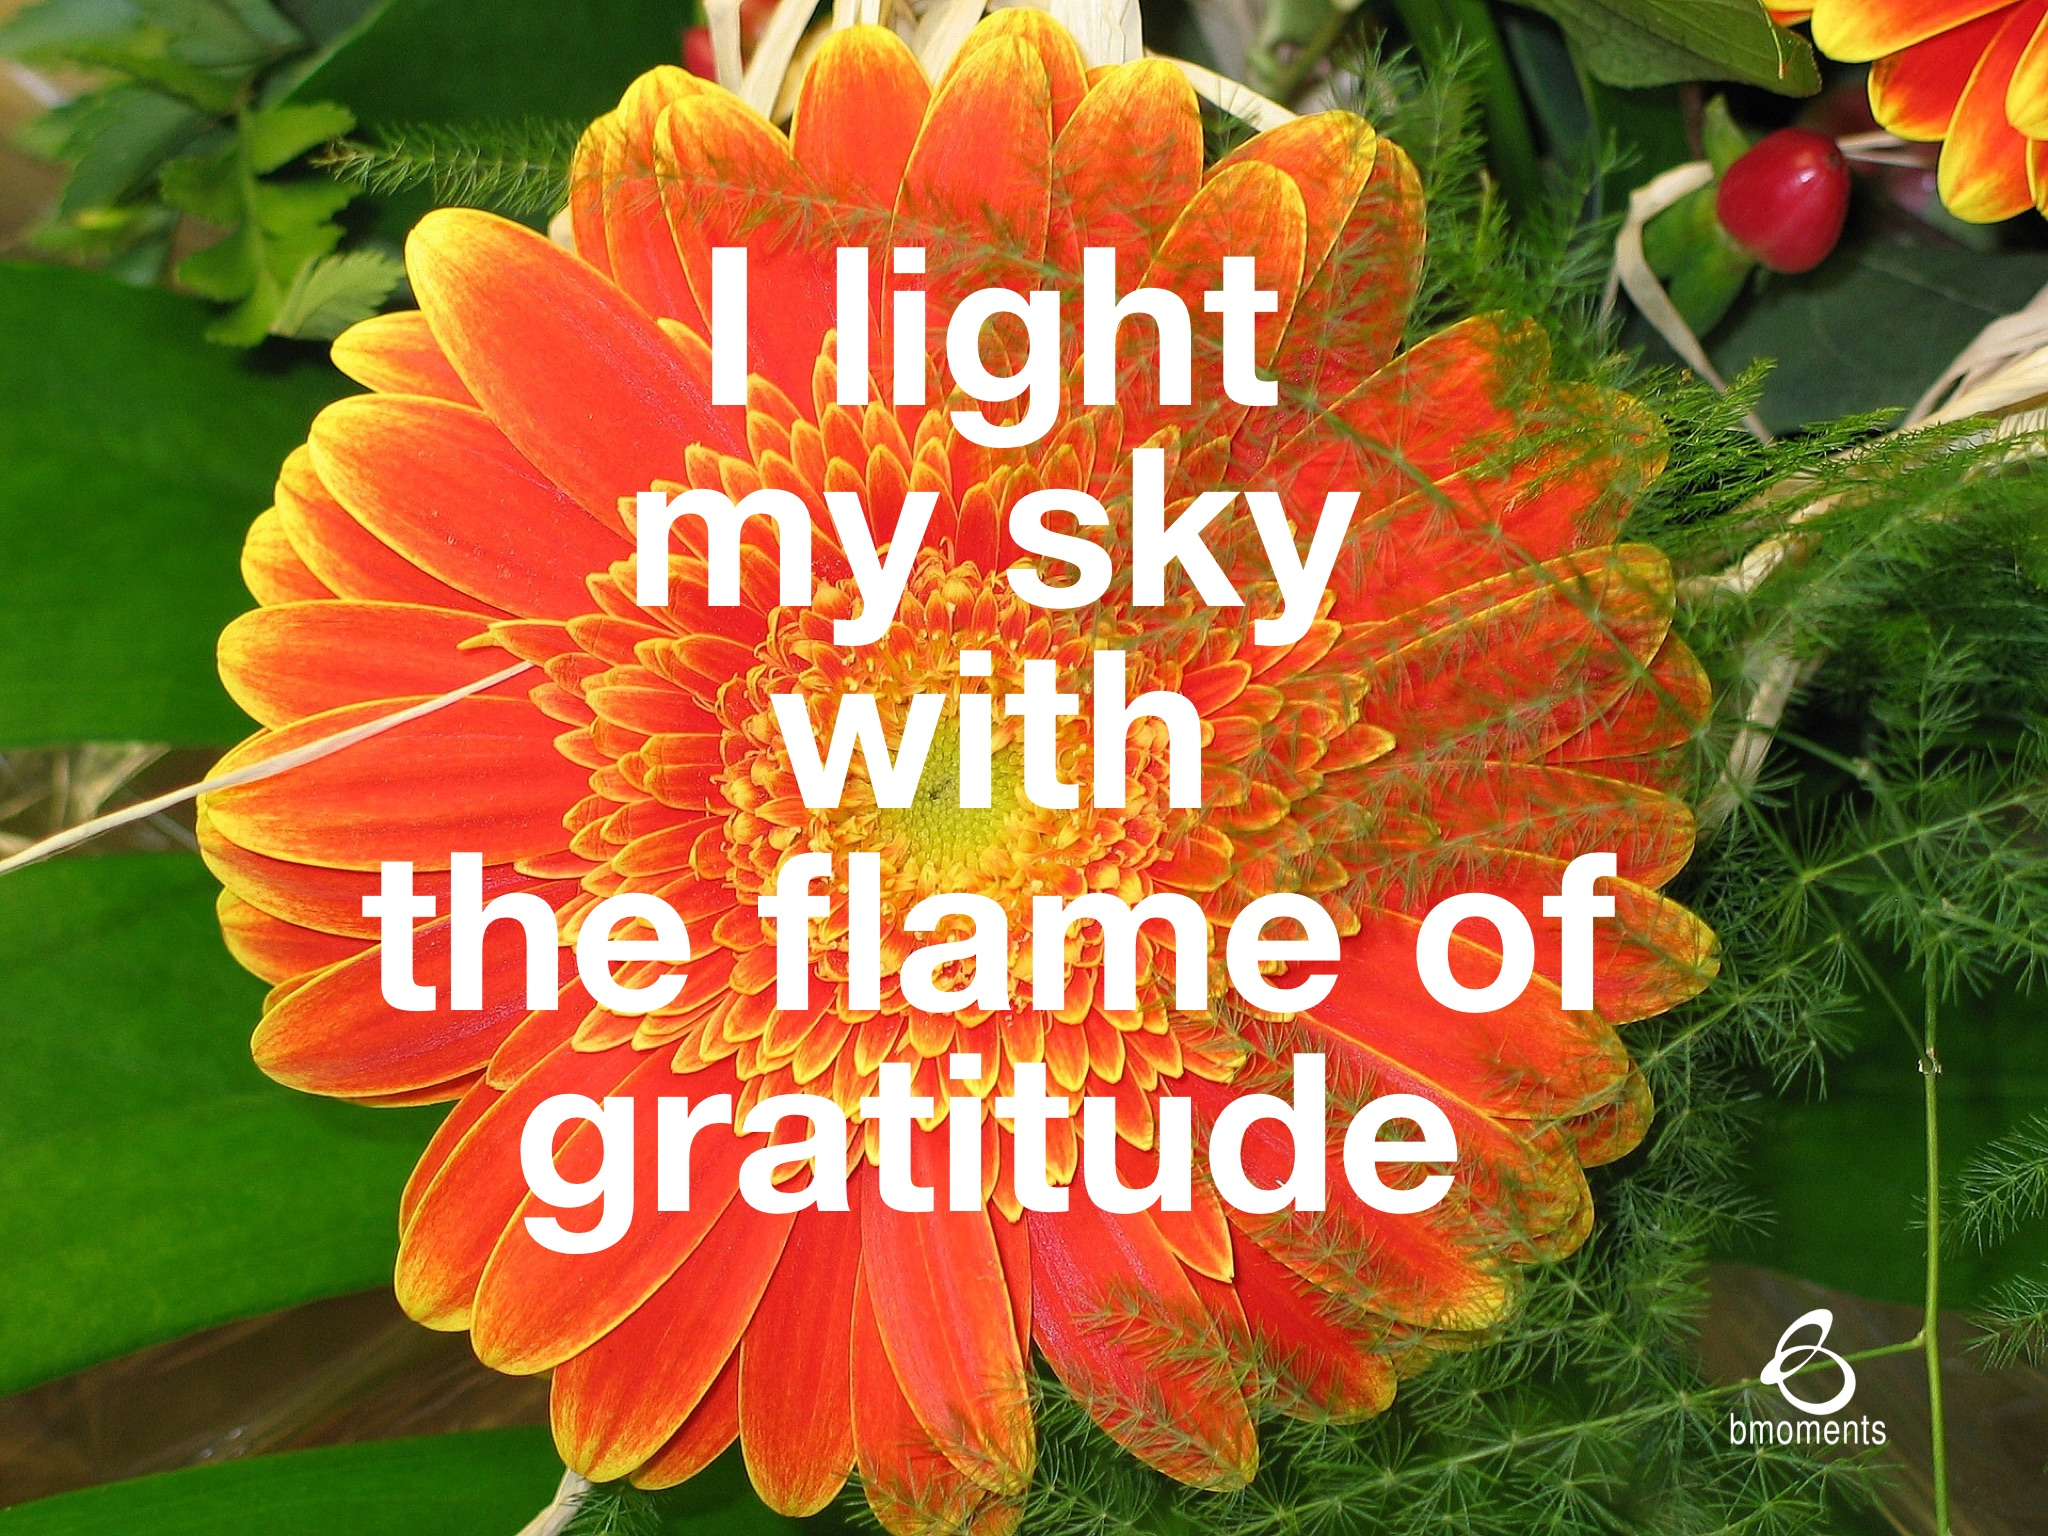 gratitude, bmoments